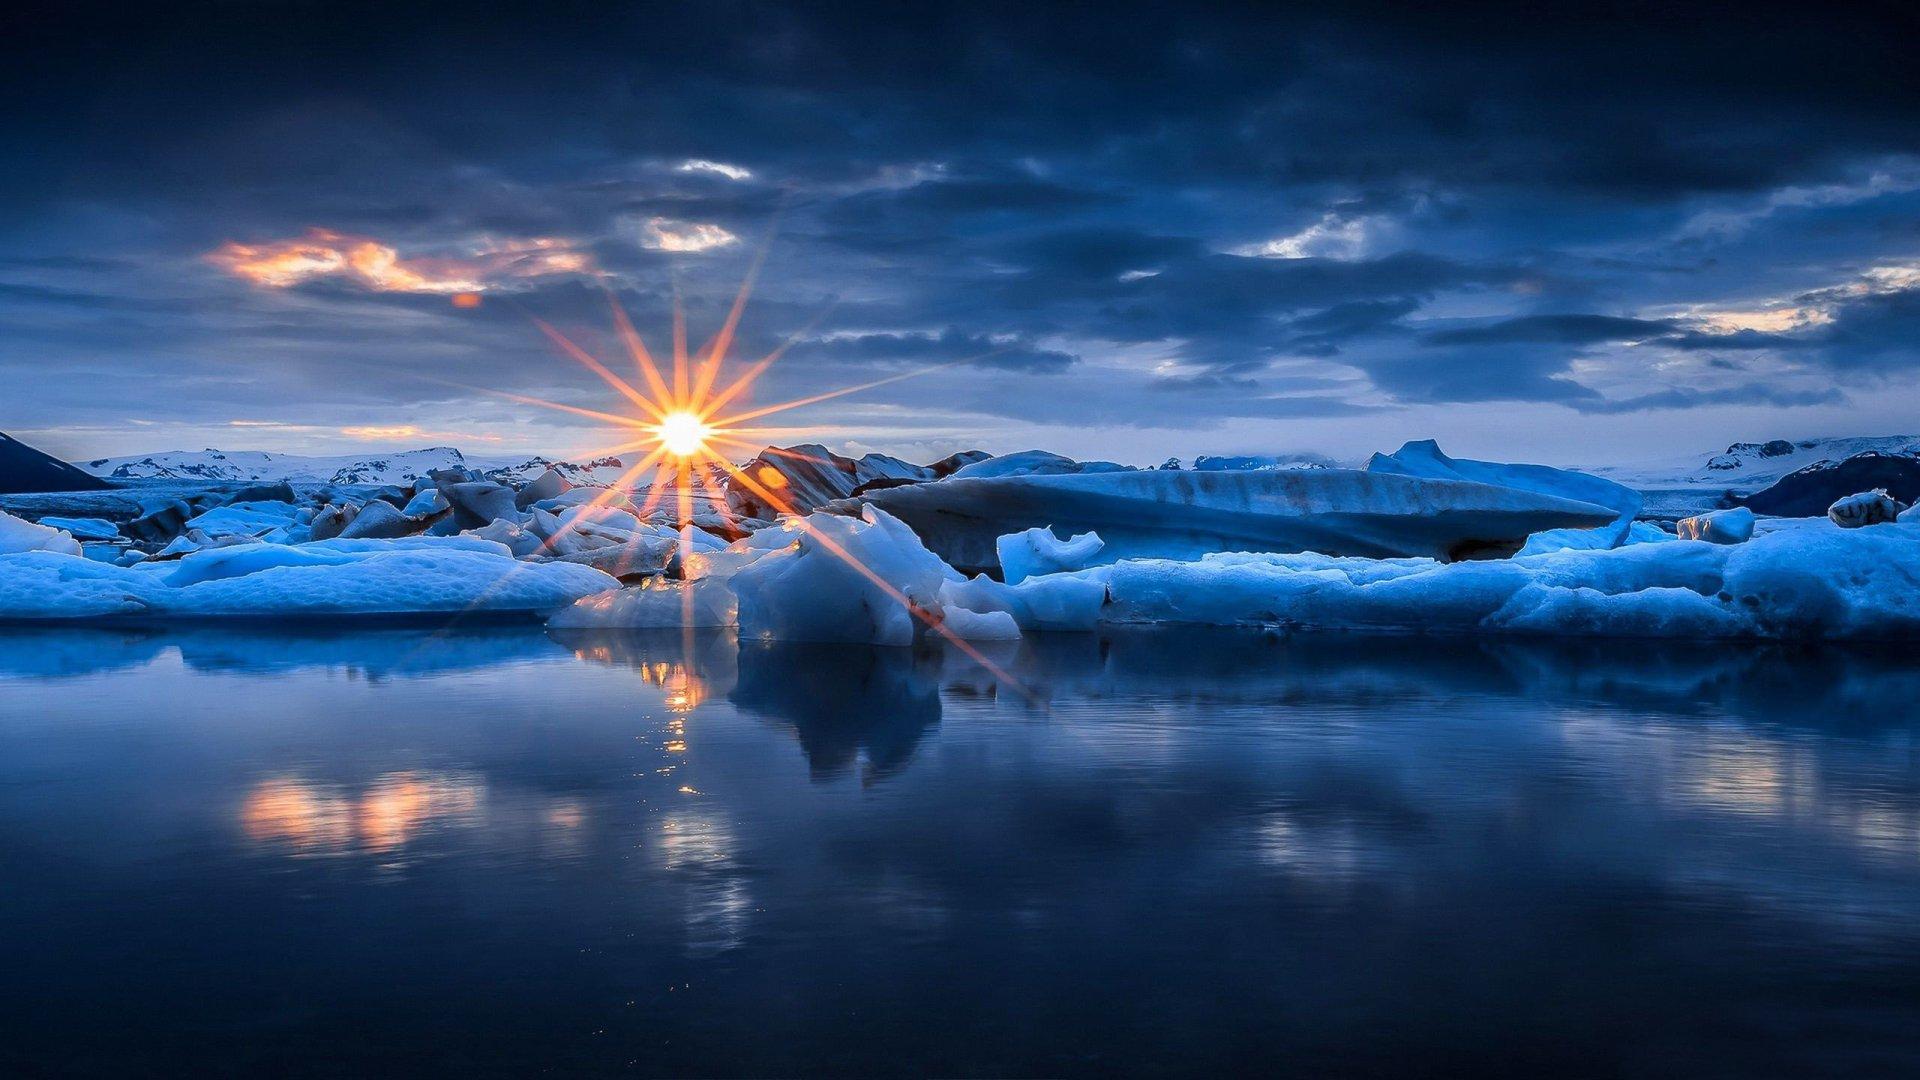 Sun Setting over Icy Winter Ocean HD Wallpaper ...